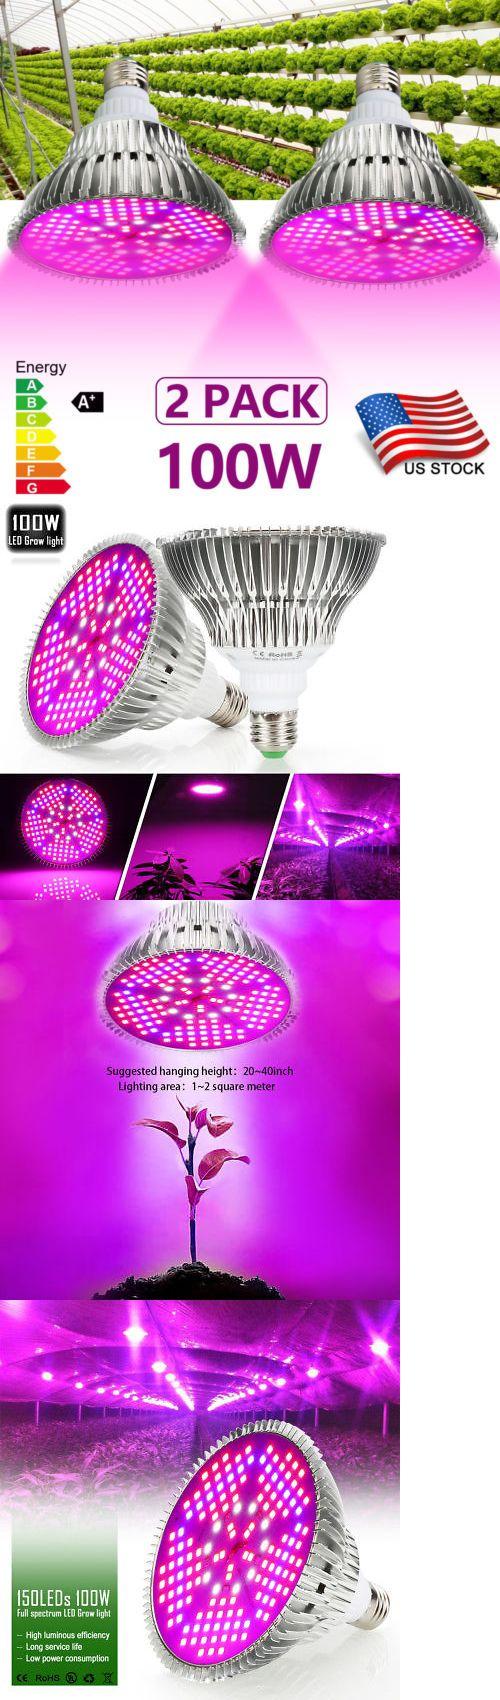 Grow Light Kits 178989 100w E27 Full Spectrum Led Grow Light Grow Lamp Bulb For Flower Plant Hydroponic Buy It Now Led Grow Lights Grow Lights Hydroponics